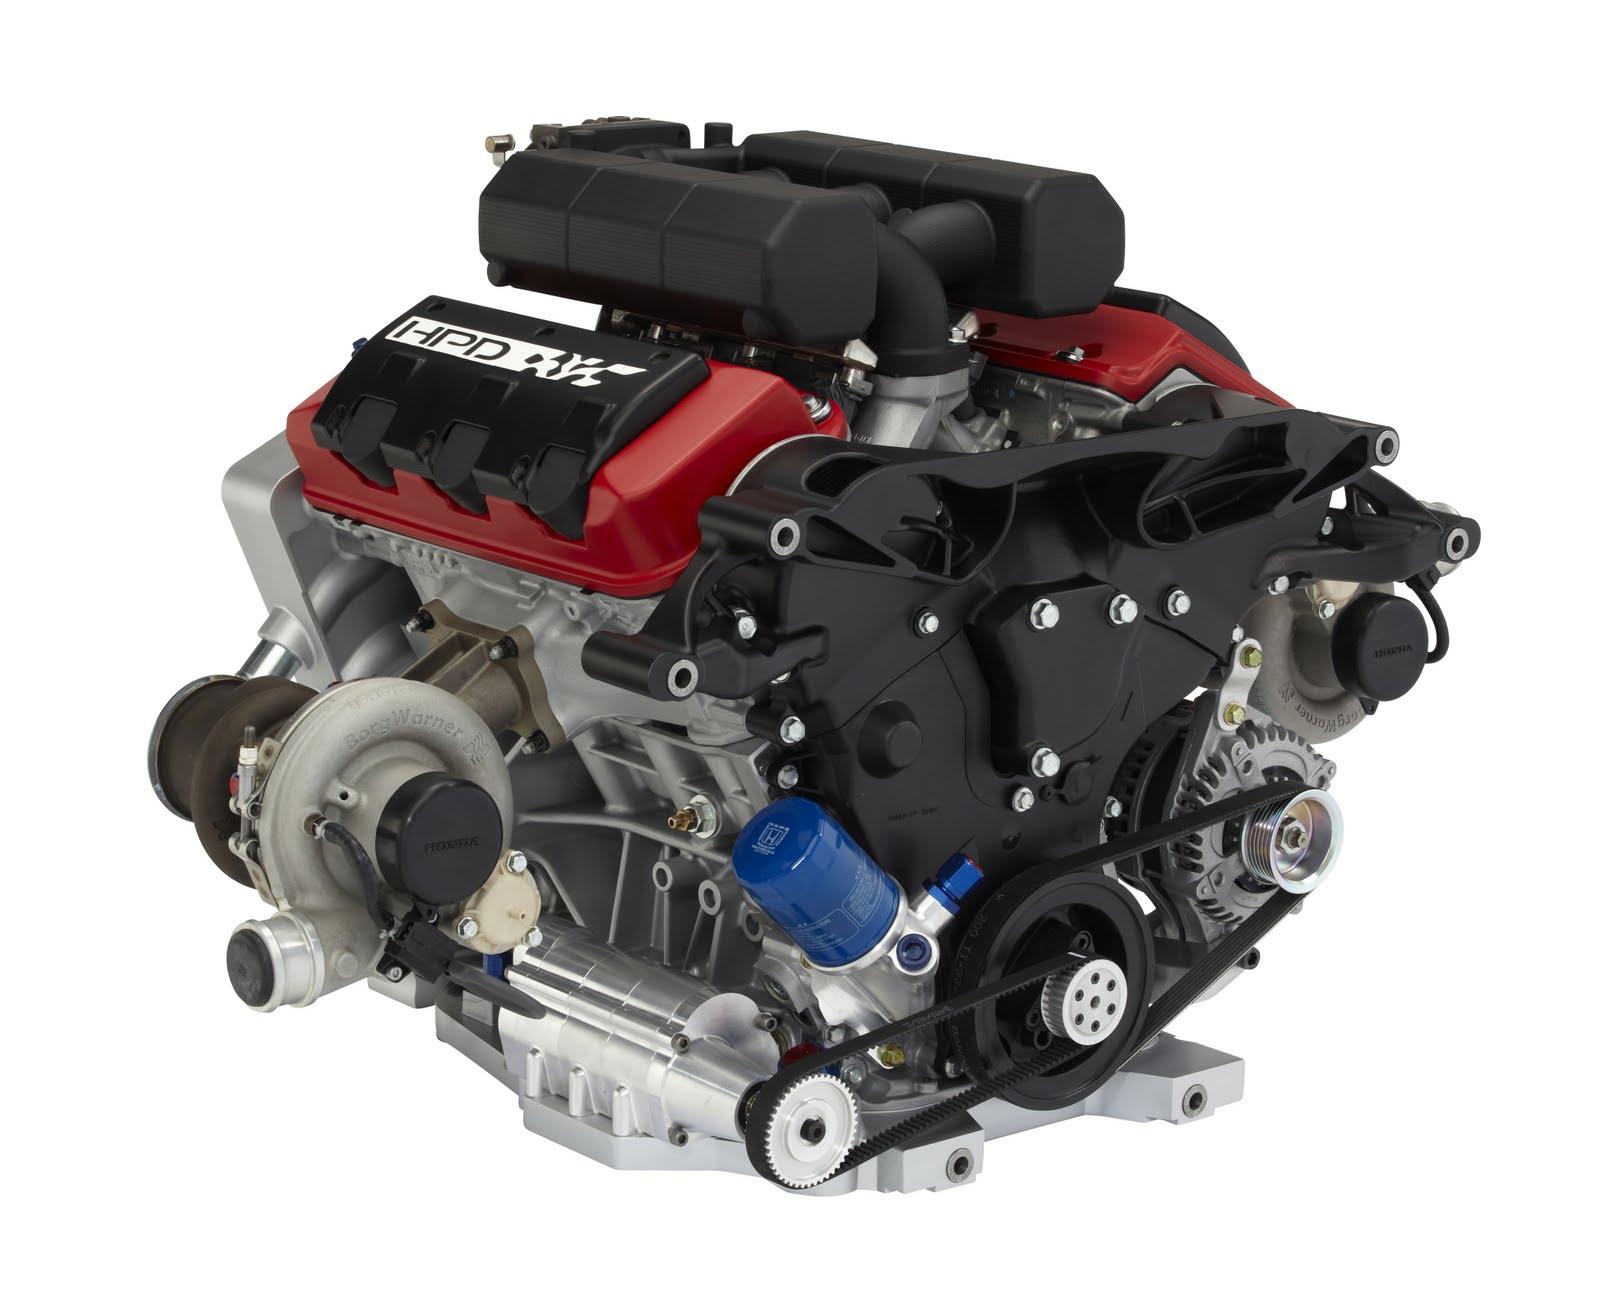 Porsche 919 Hybrid With Turbocharged V4 2 0 Liter Engine